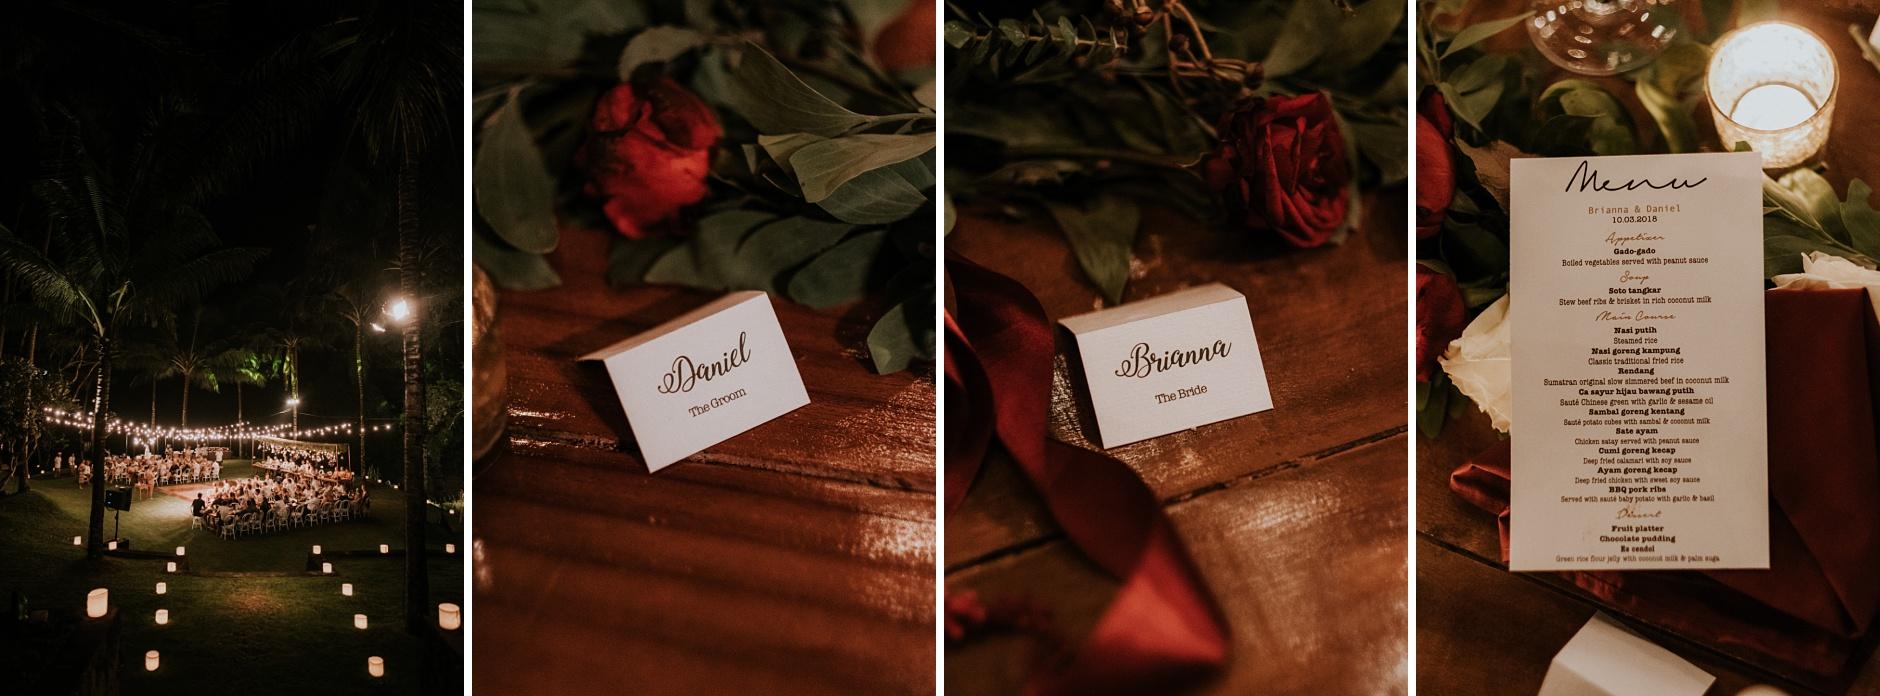 breanna&dan0595a_Bali-Wedding-Photographer.jpg